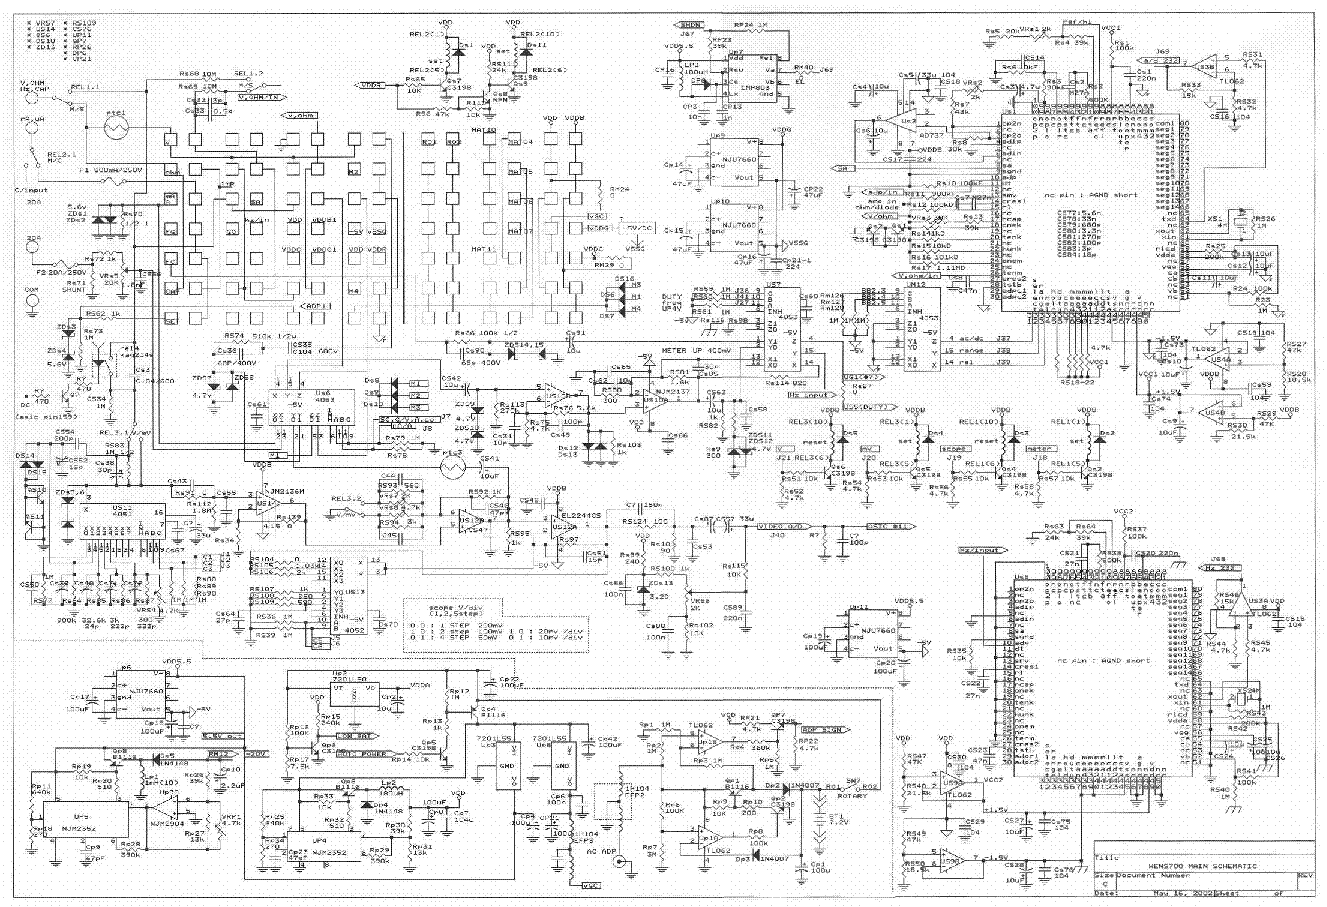 voltcraft dmm vc920 960 sch service manual free download  schematics  eeprom  repair info for